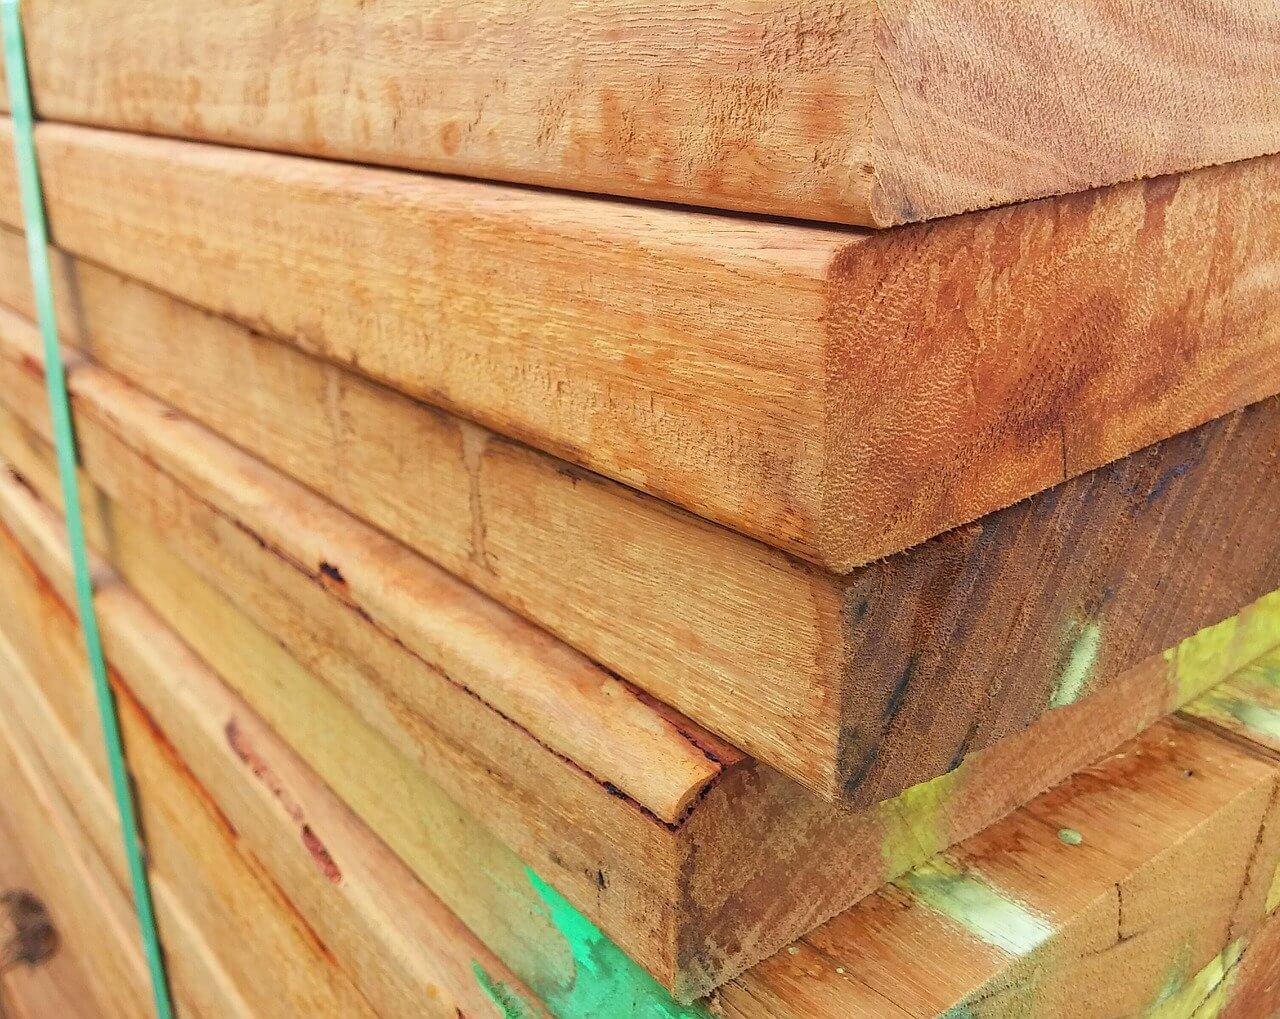 Timber frame disposal